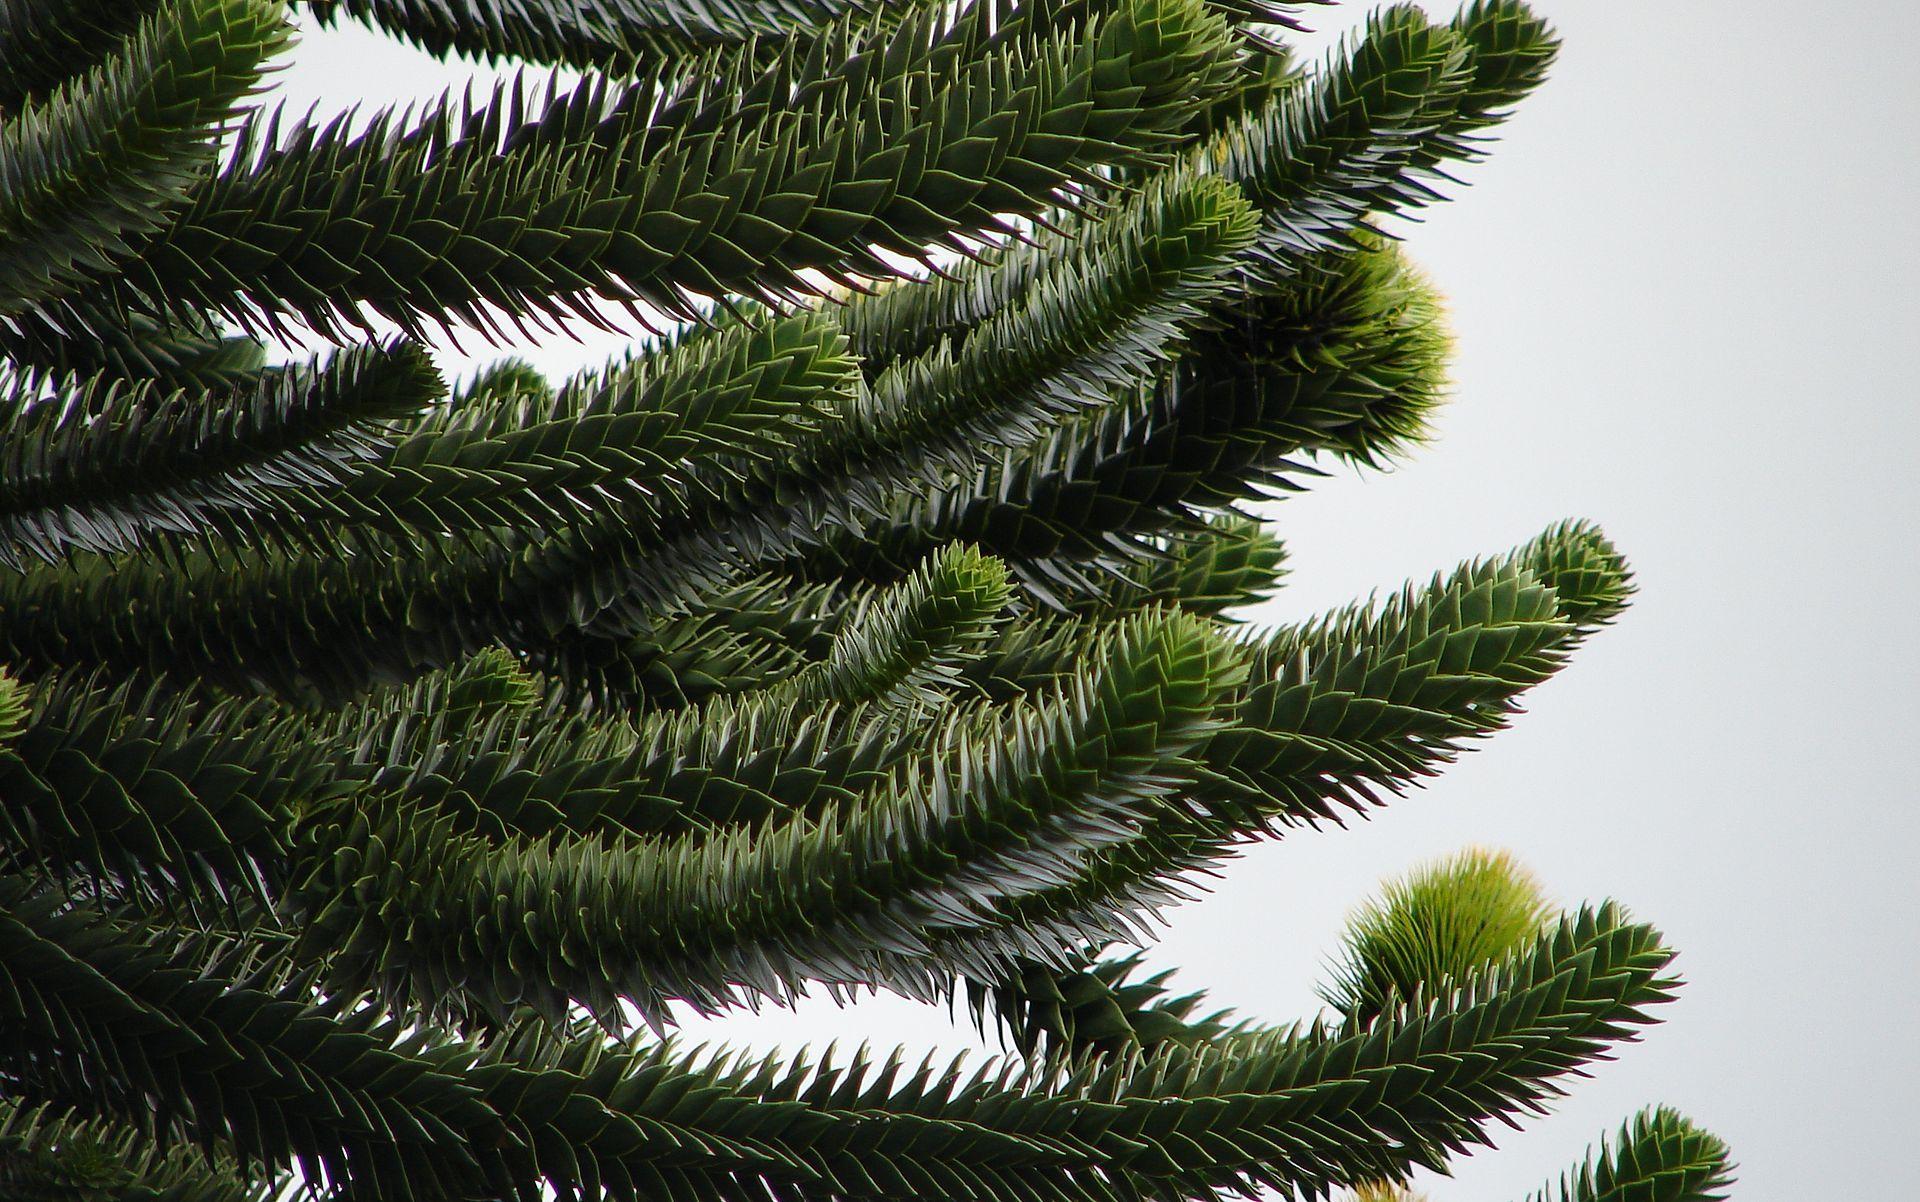 Araucaria Araucana Types Of Pine Trees Beautiful Tree Gymnosperm